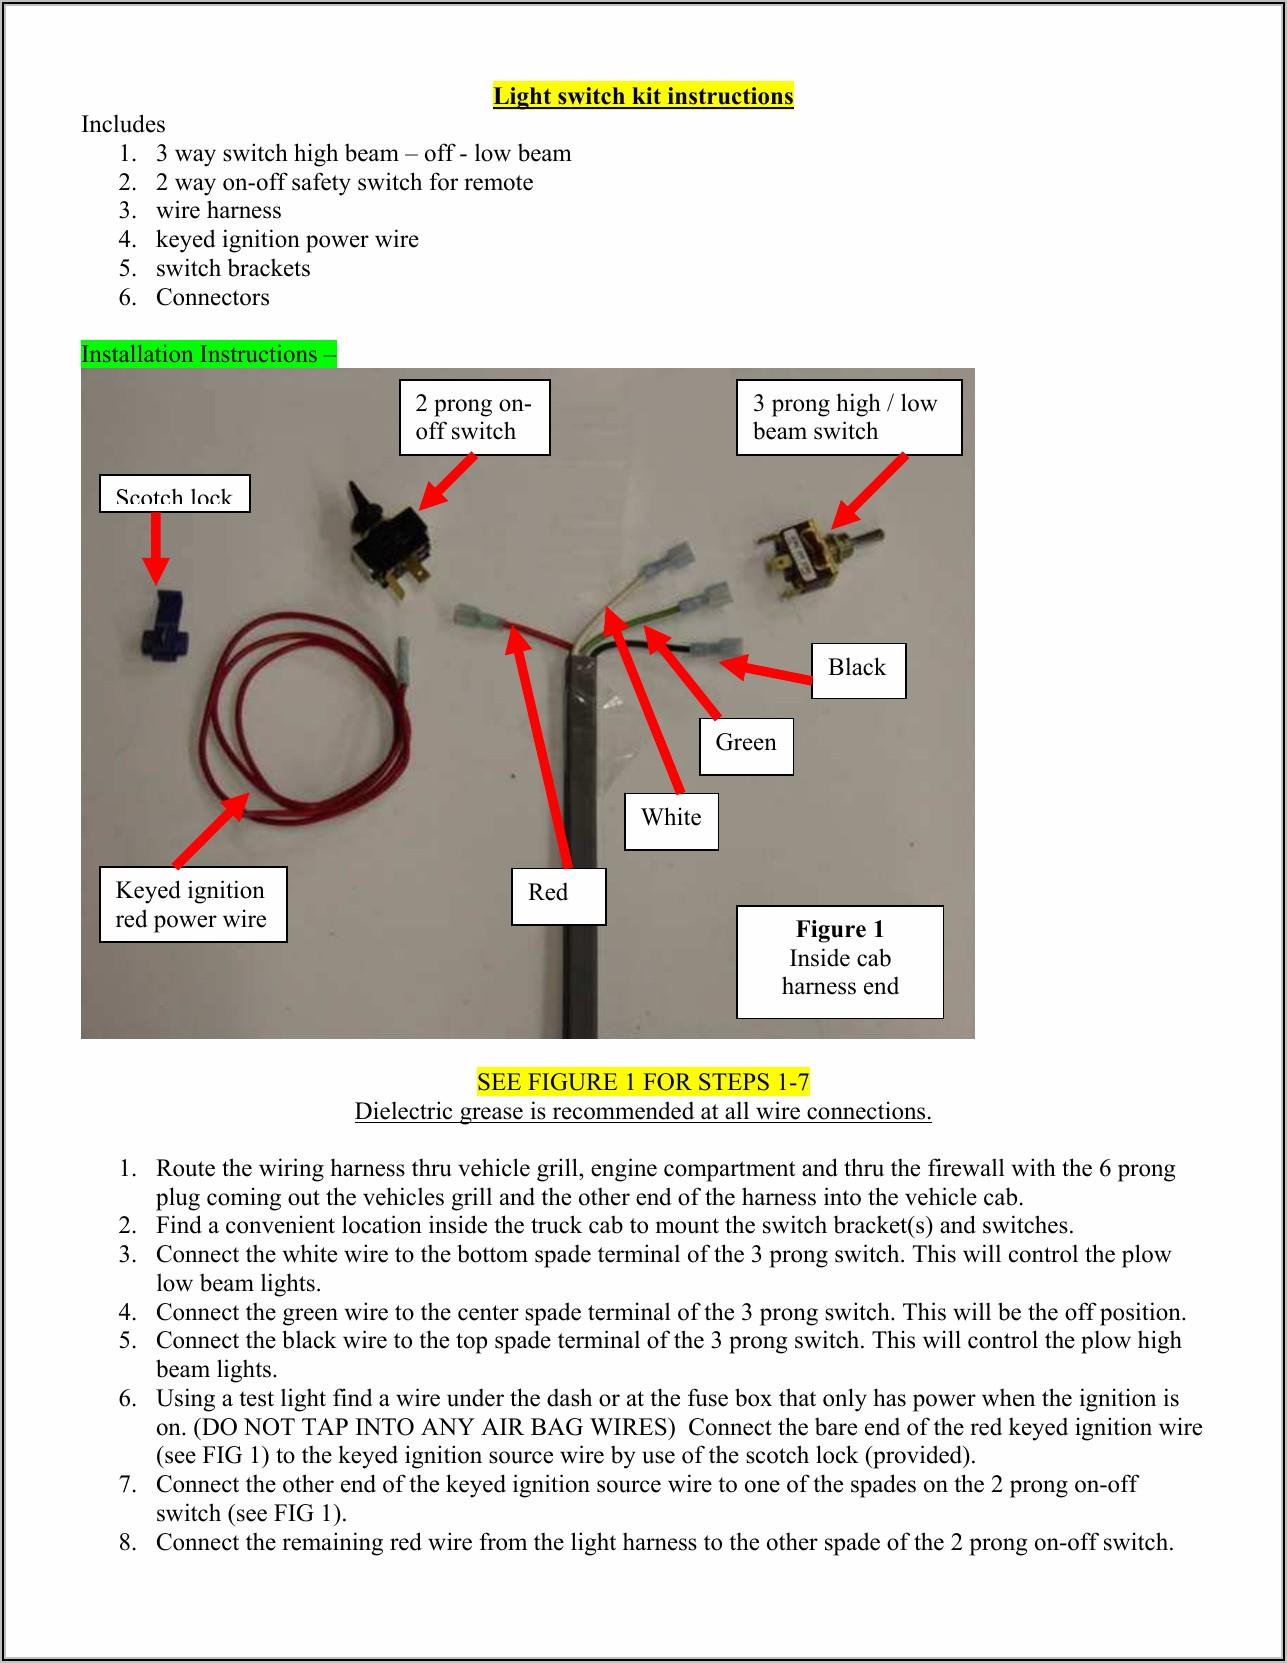 3 Way Light Switch Instructions